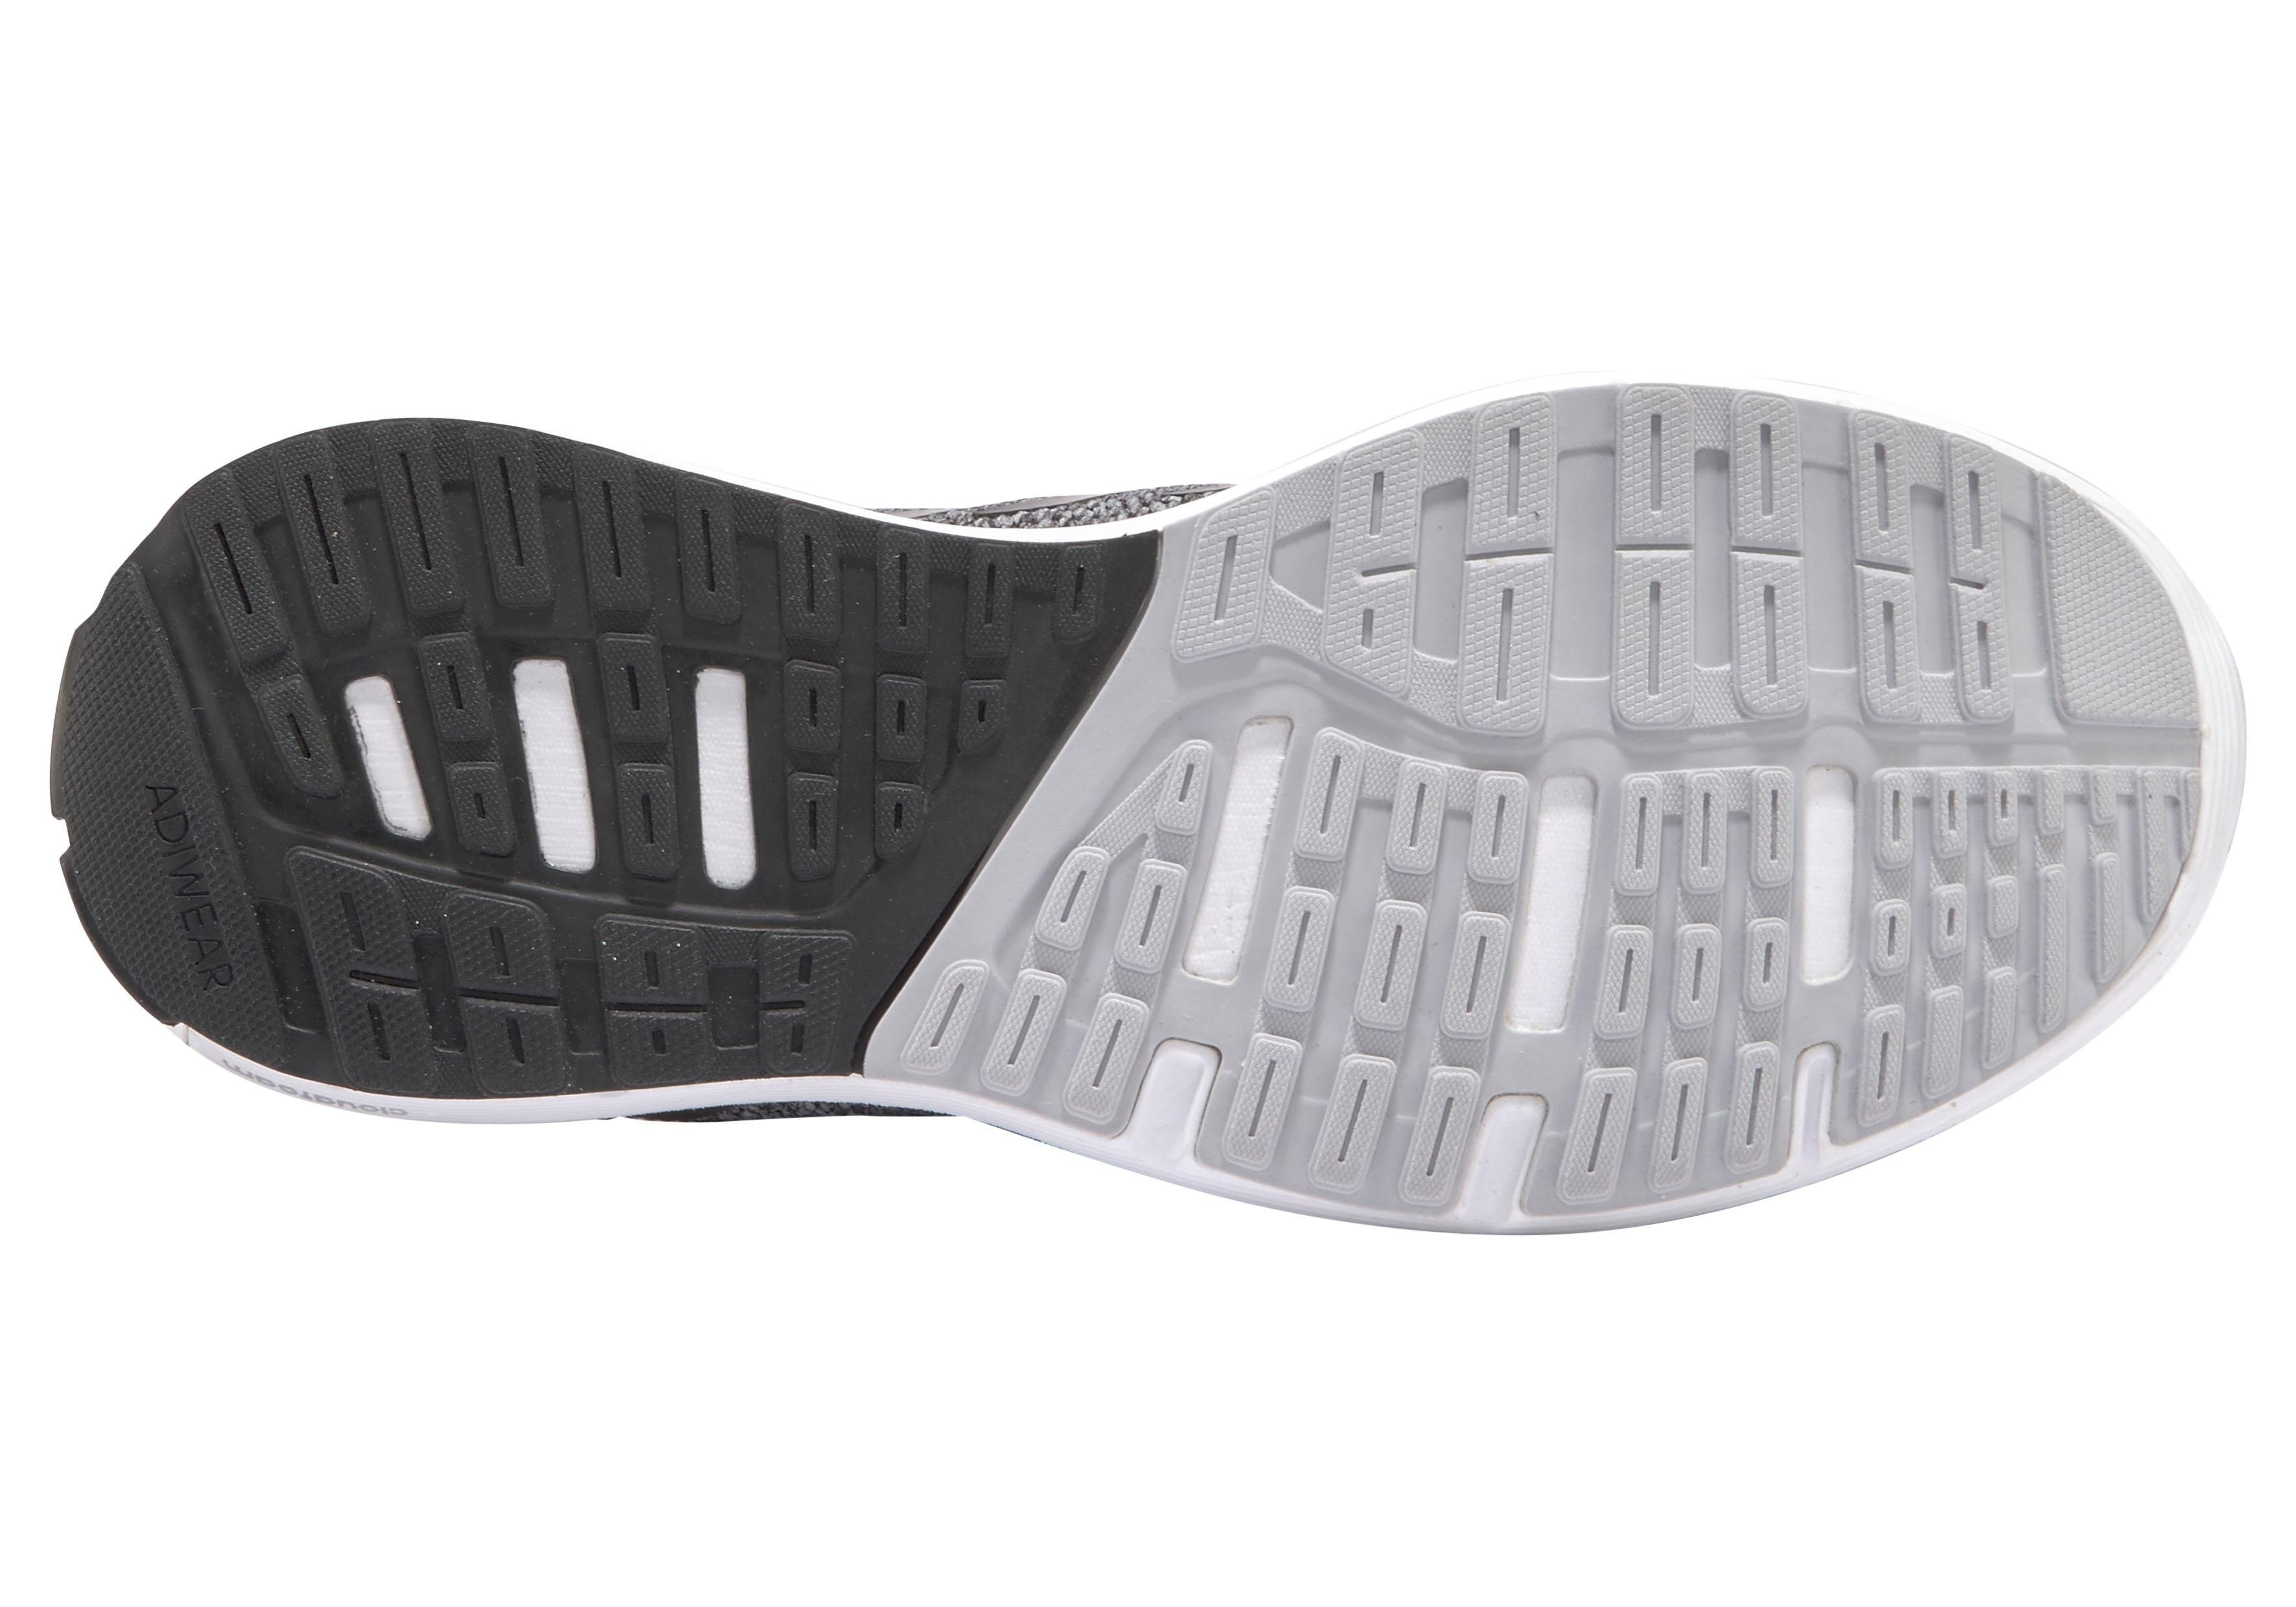 Online Adidas Adidas Bestellen 2 Adidas 2 Bestellen Online Runningschoenencosmic Runningschoenencosmic Runningschoenencosmic thdrQsC